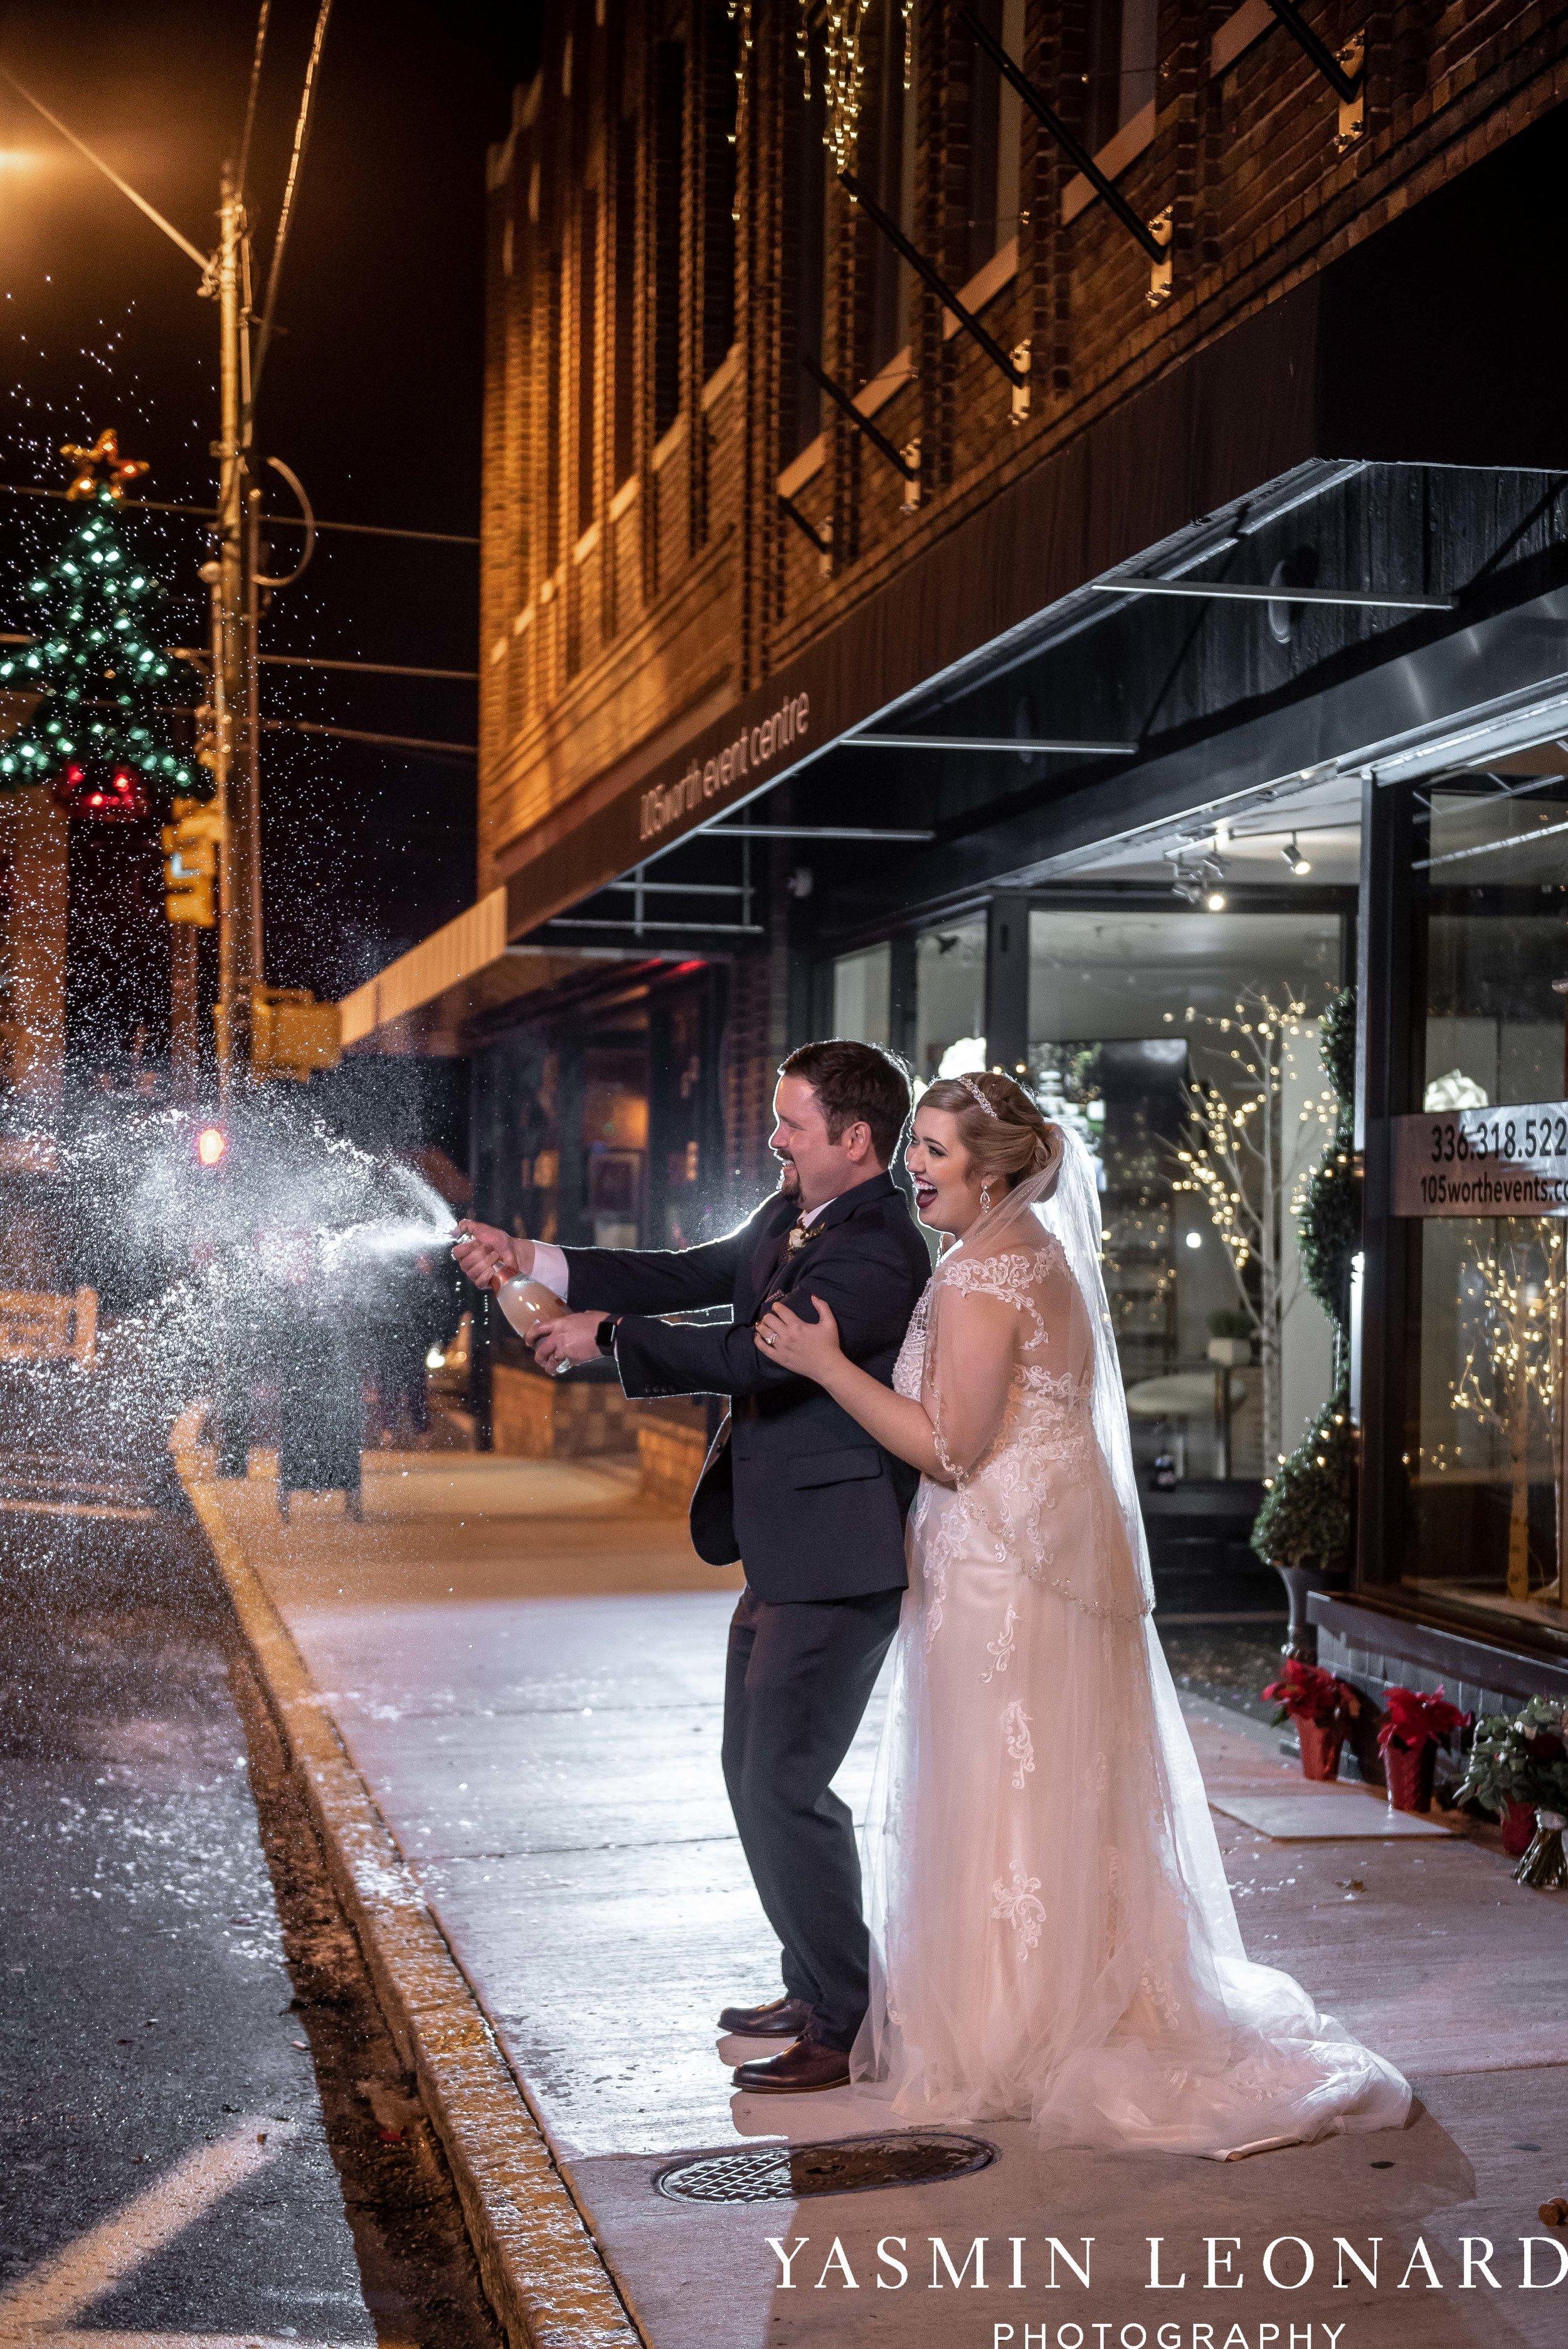 Rebekah and Matt - 105 Worth Event Centre - Yasmin Leonard Photography - Asheboro Wedding - NC Wedding - High Point Weddings - Triad Weddings - Winter Wedding-43.jpg